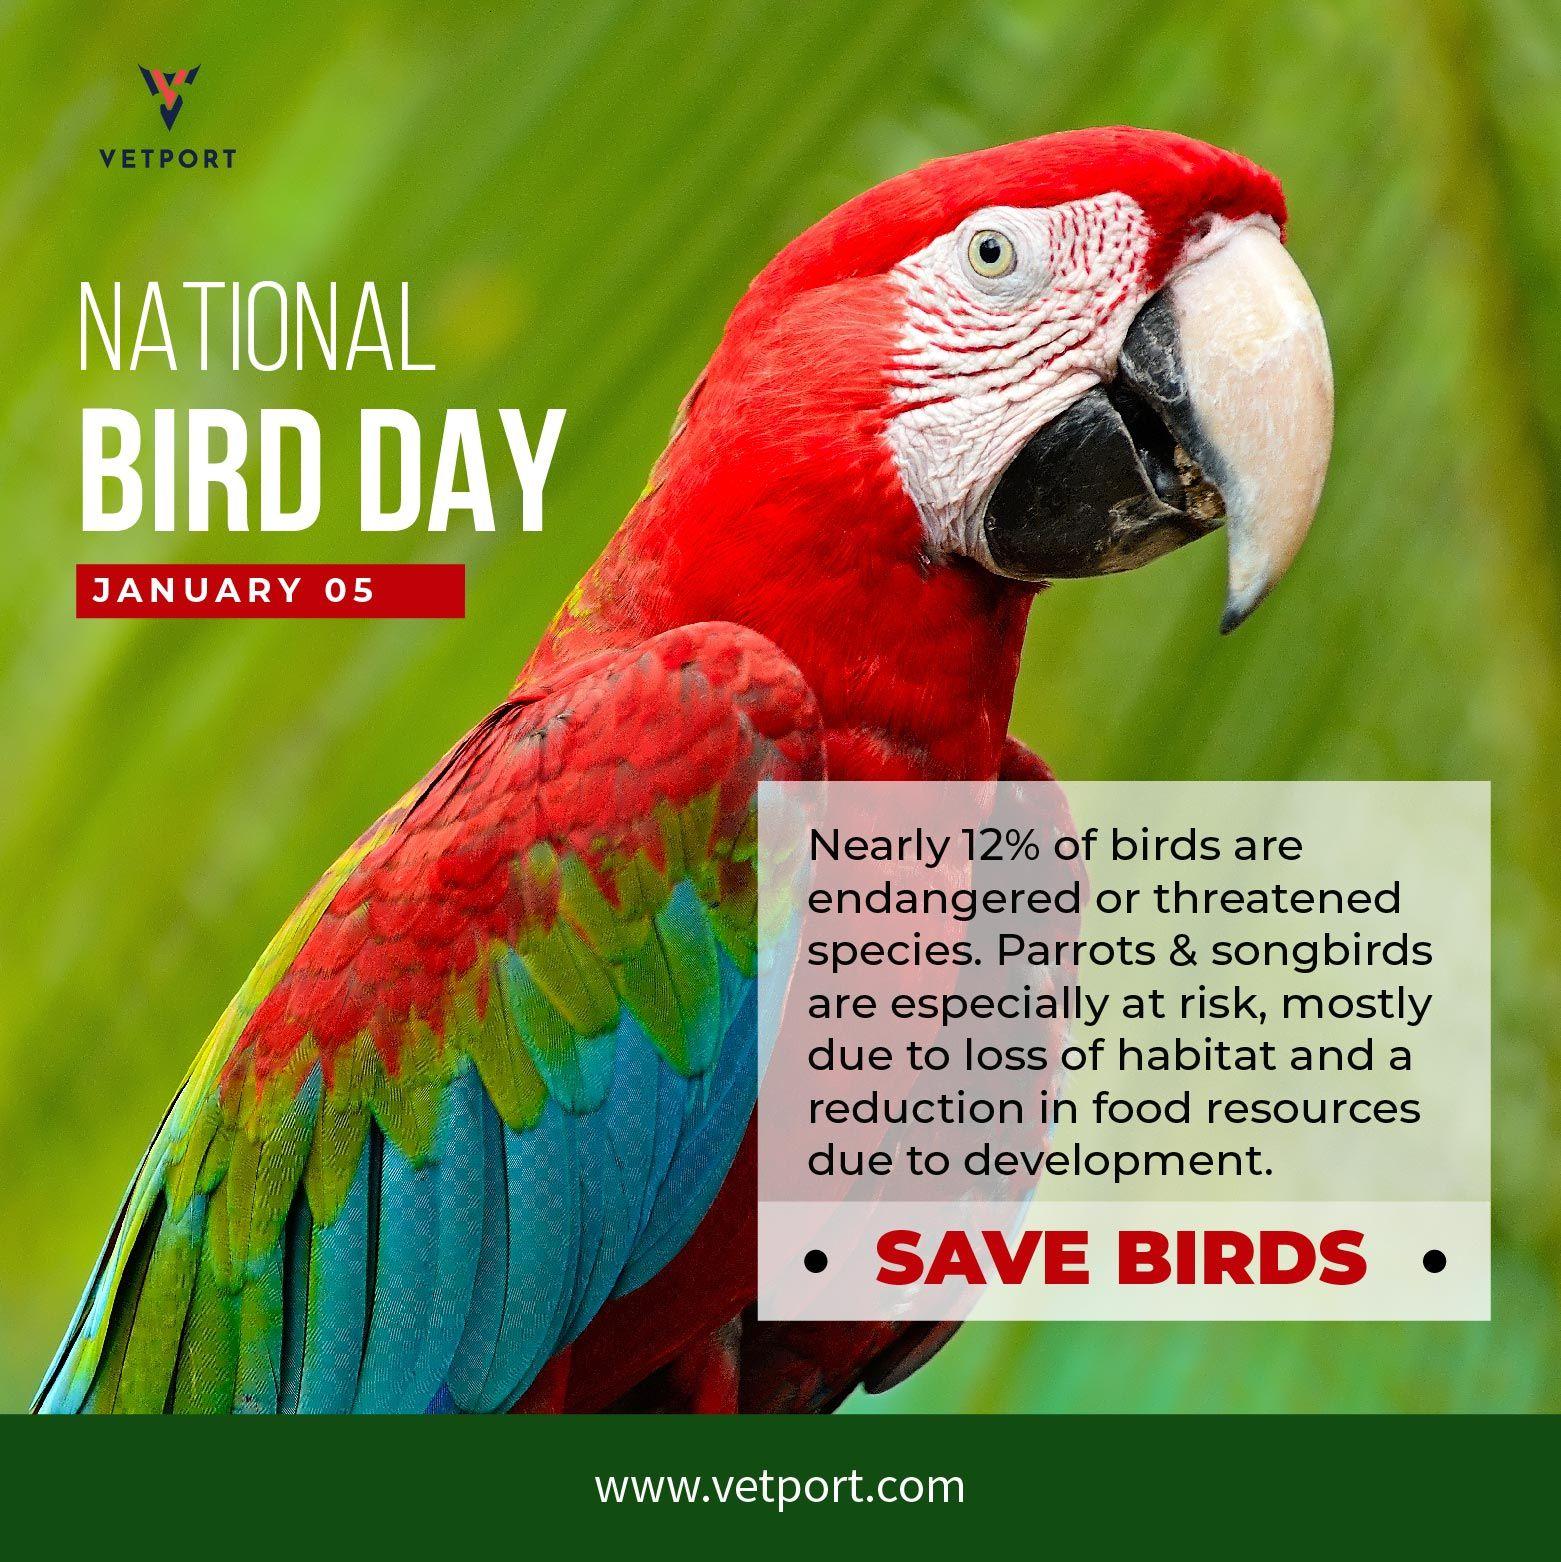 National Bird Day 2019 Veterinary Bird Day